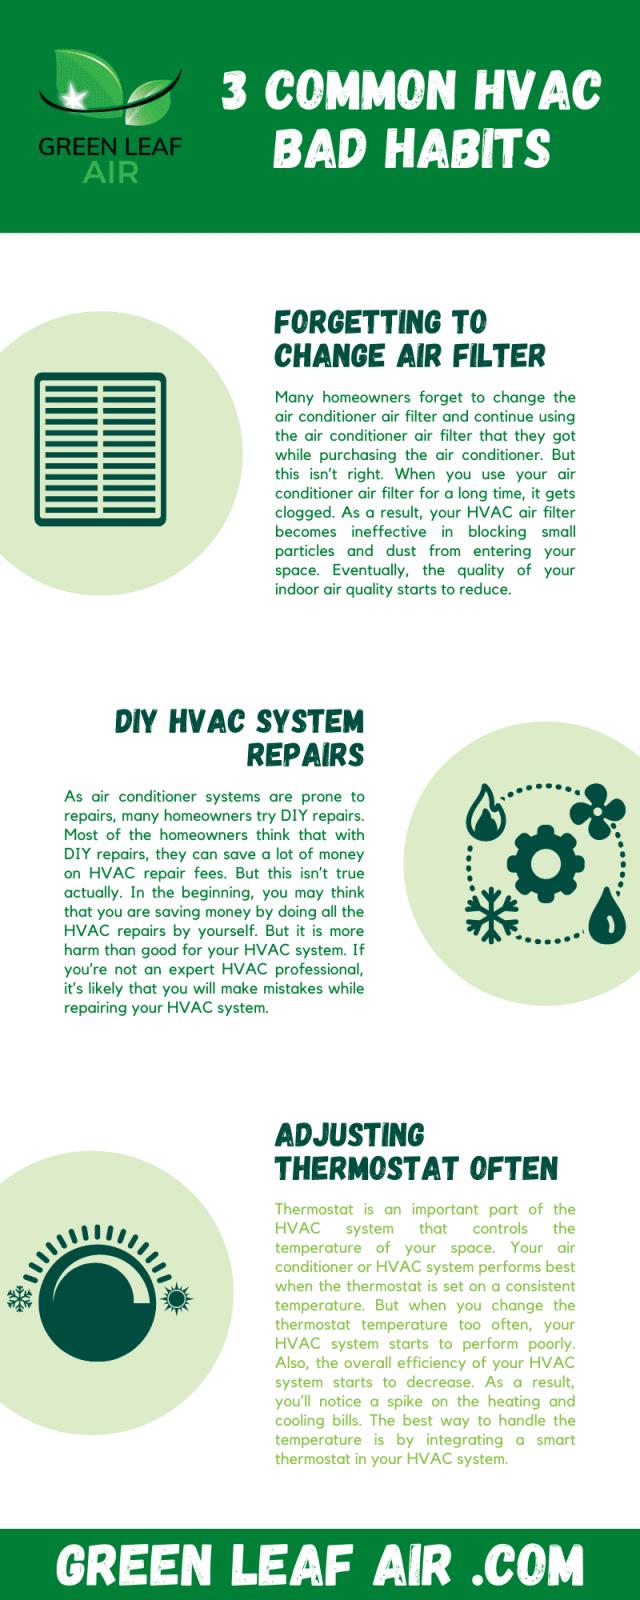 3 Common HVAC Bad Habits